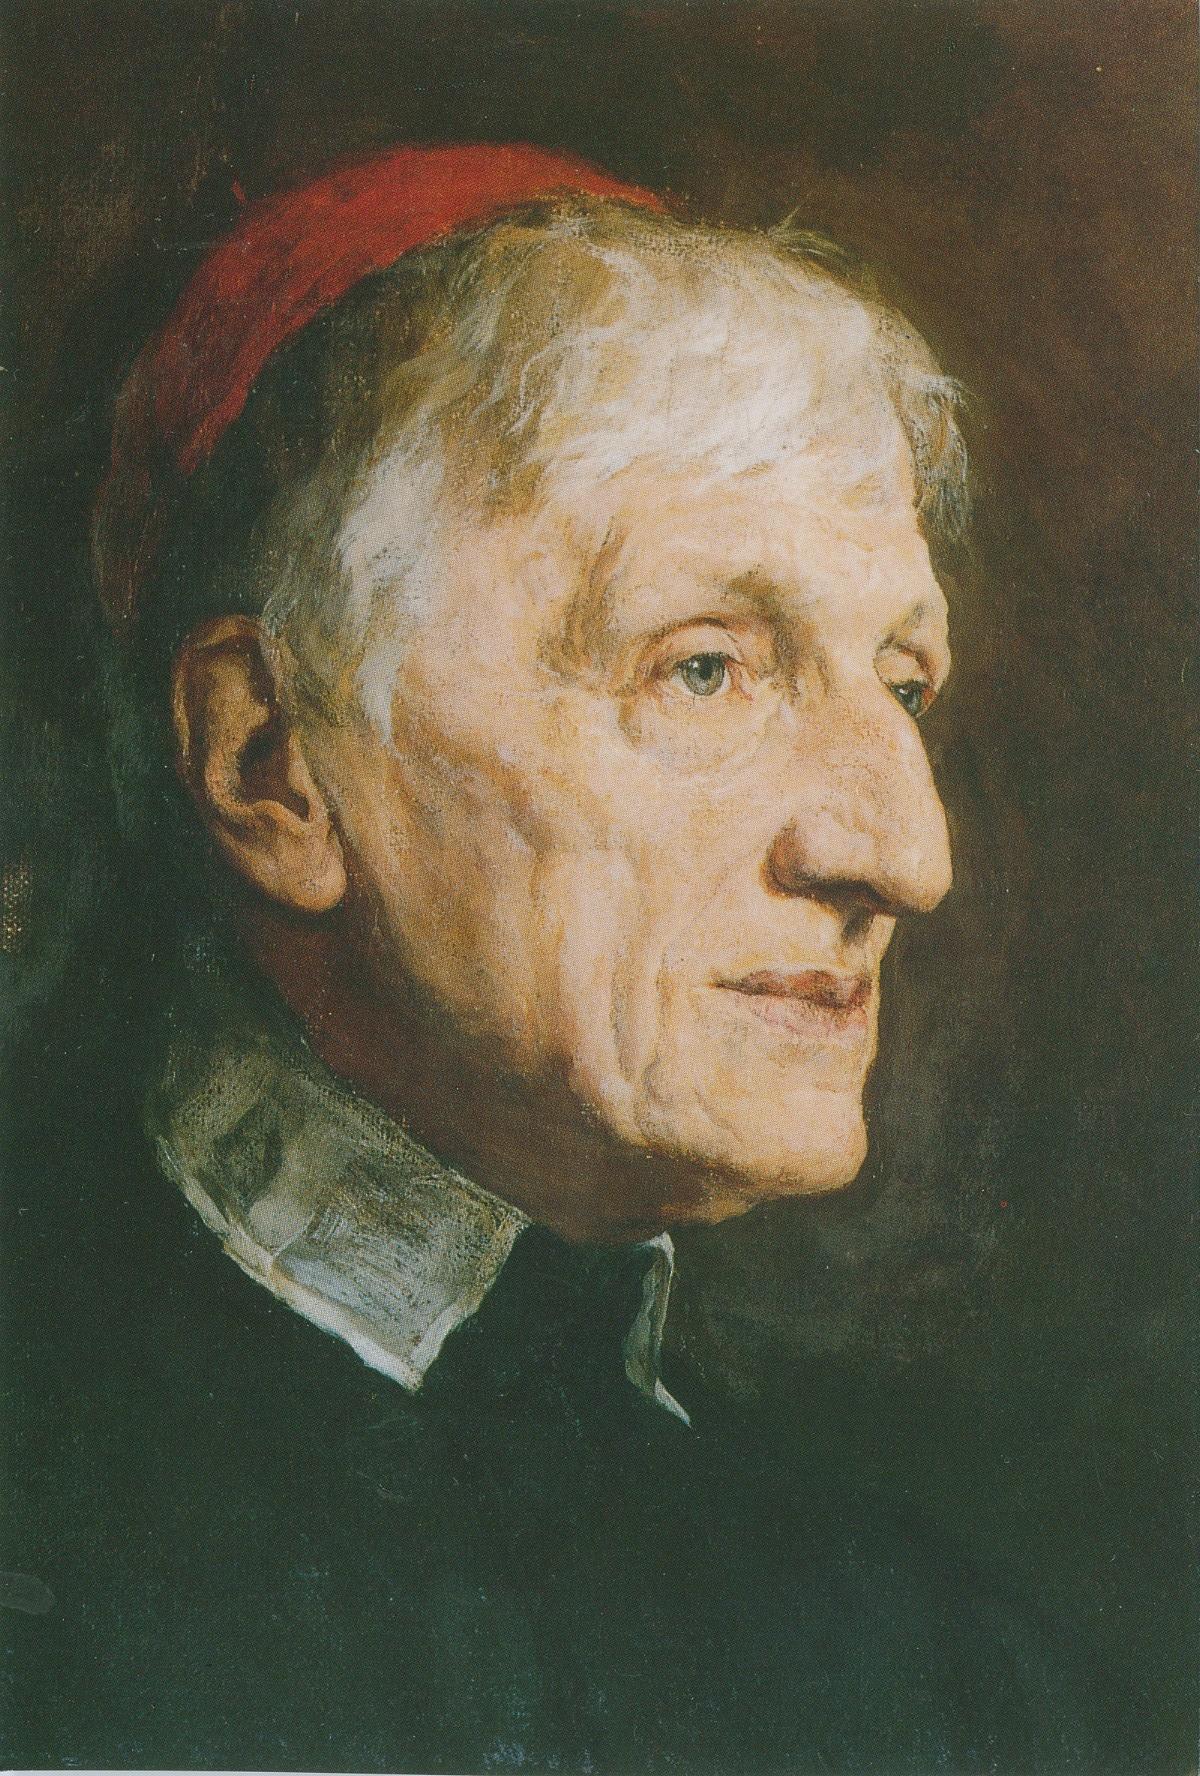 Blessed John Henry Cardinal Newman